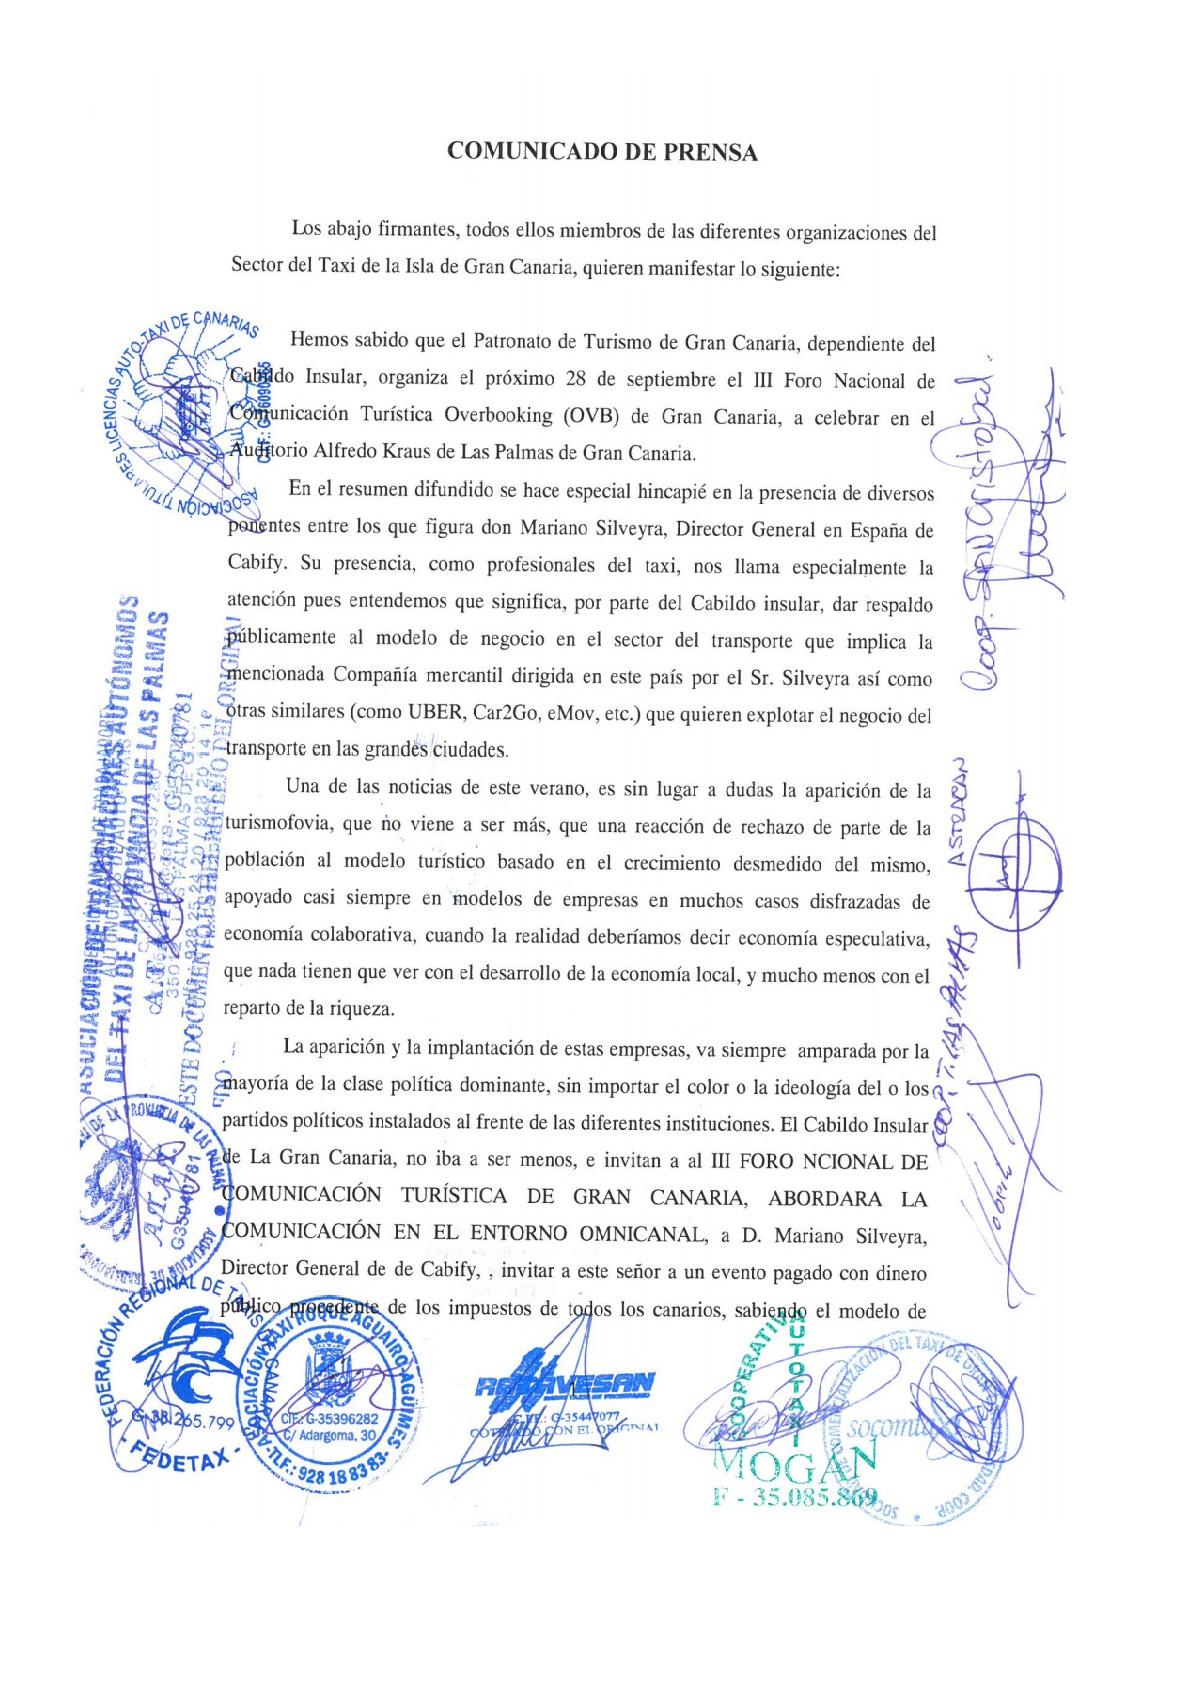 COMUNICADO-DE-PRENSA-001